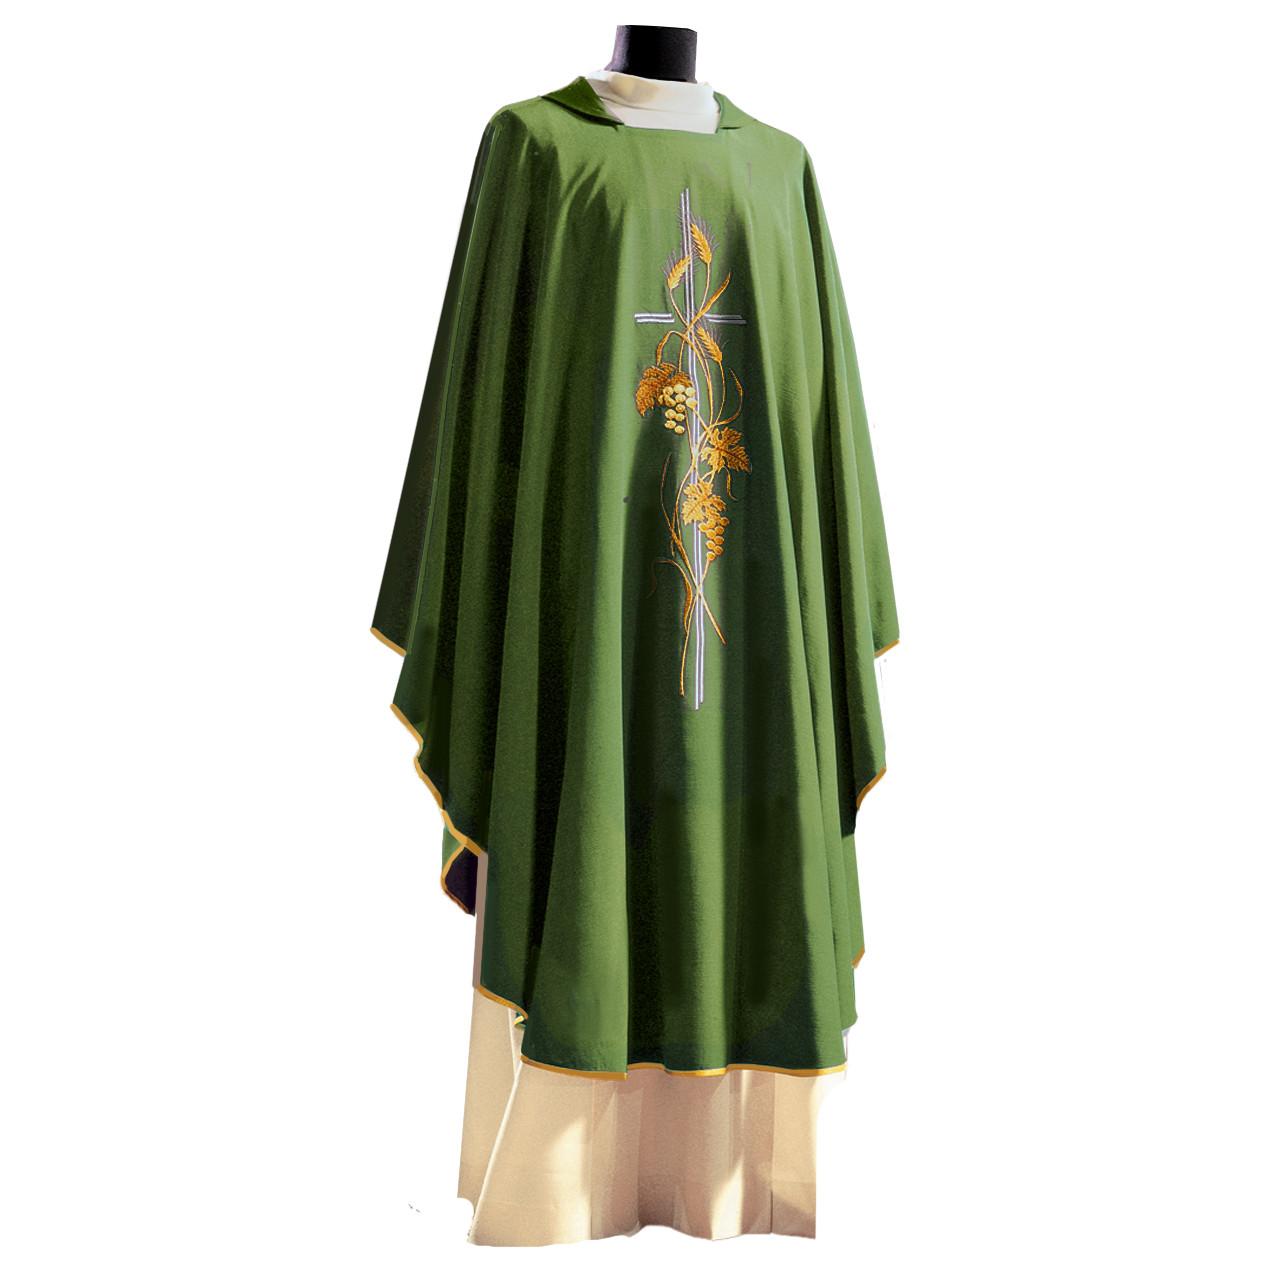 702 Chasuble in Misto Lana